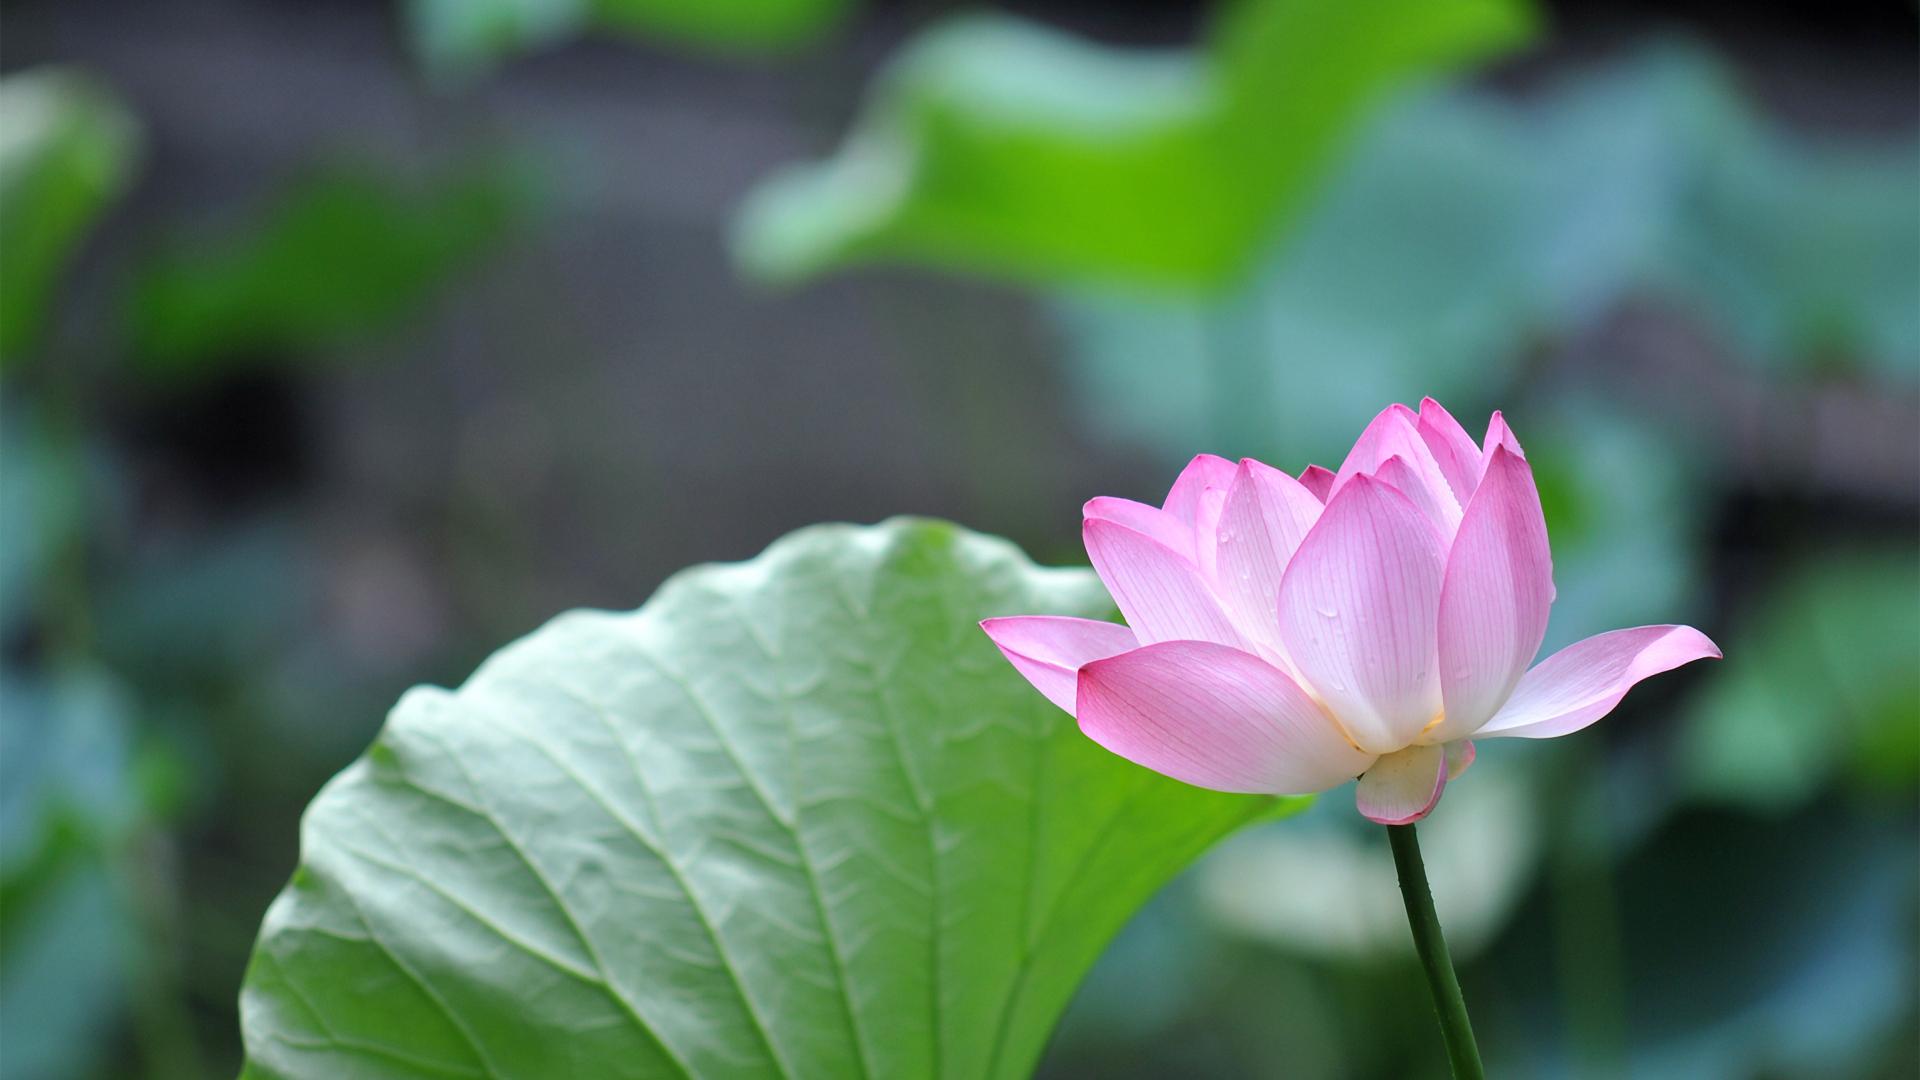 Download 1920x1080 Wallpaper Pink Lotus Flower Leaves